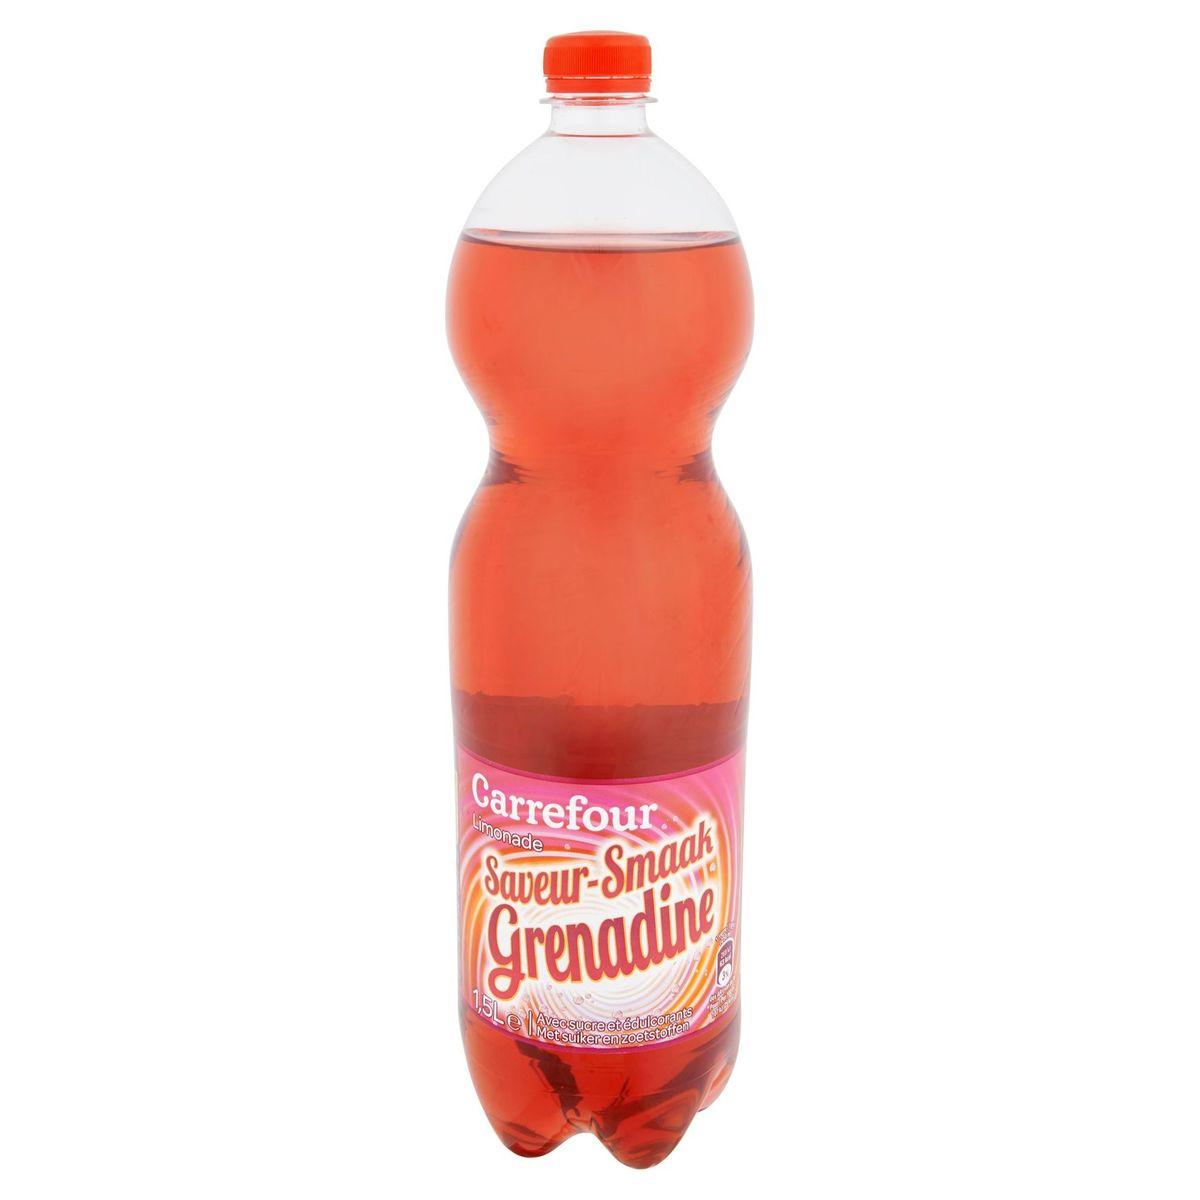 Carrefour Limonade Saveur Grenadine 1.5 L